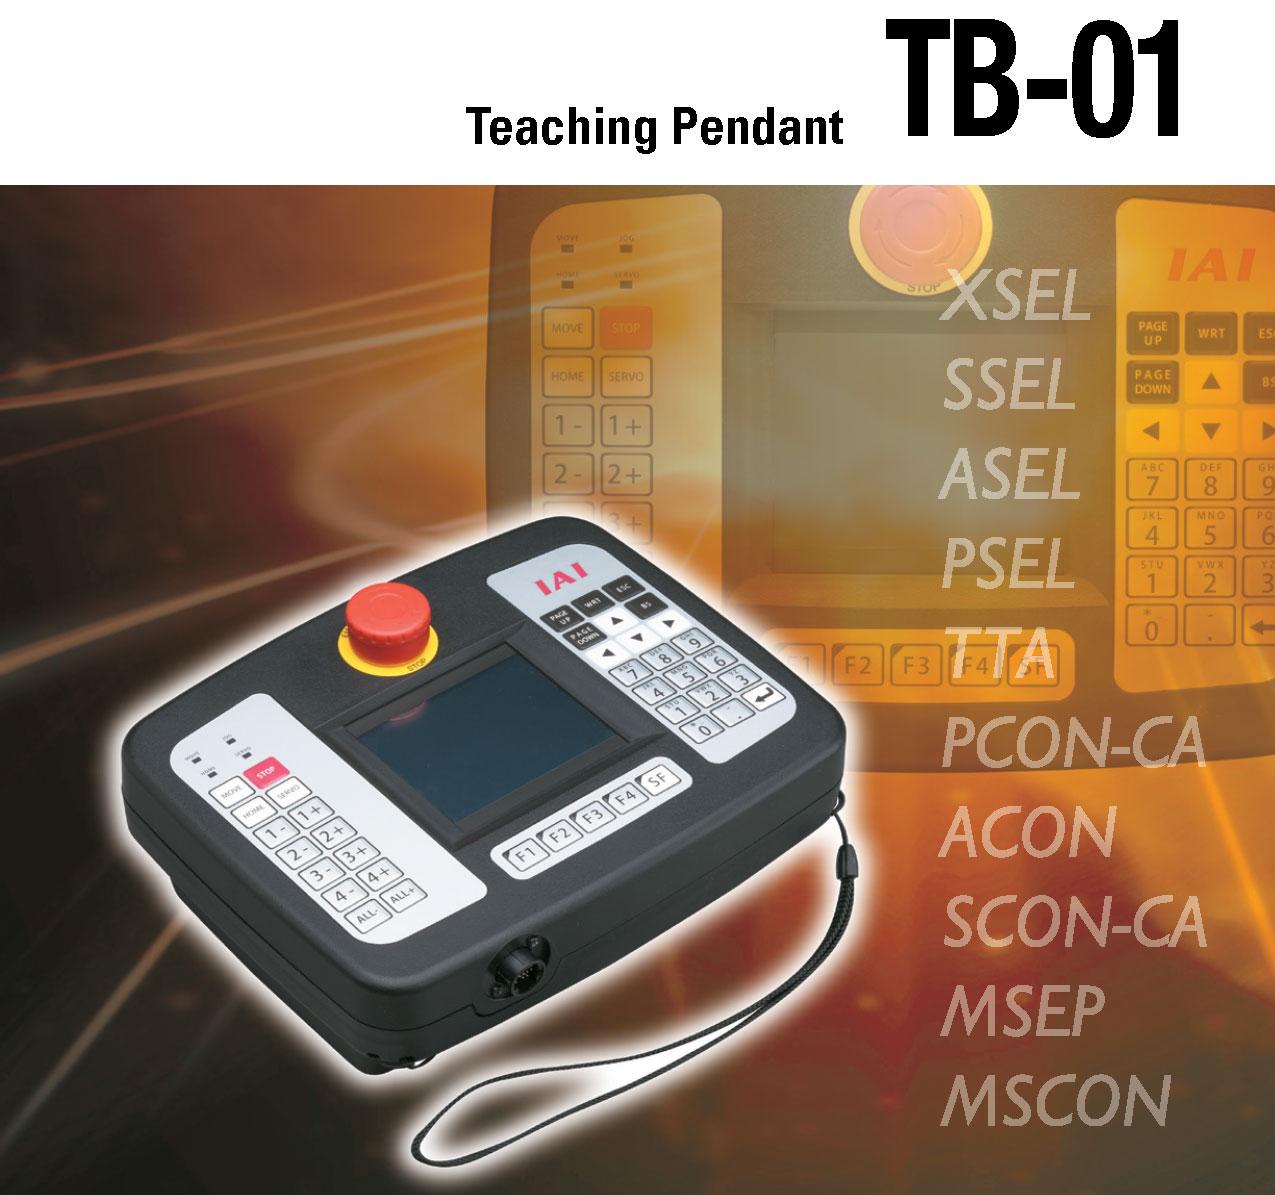 TB-01